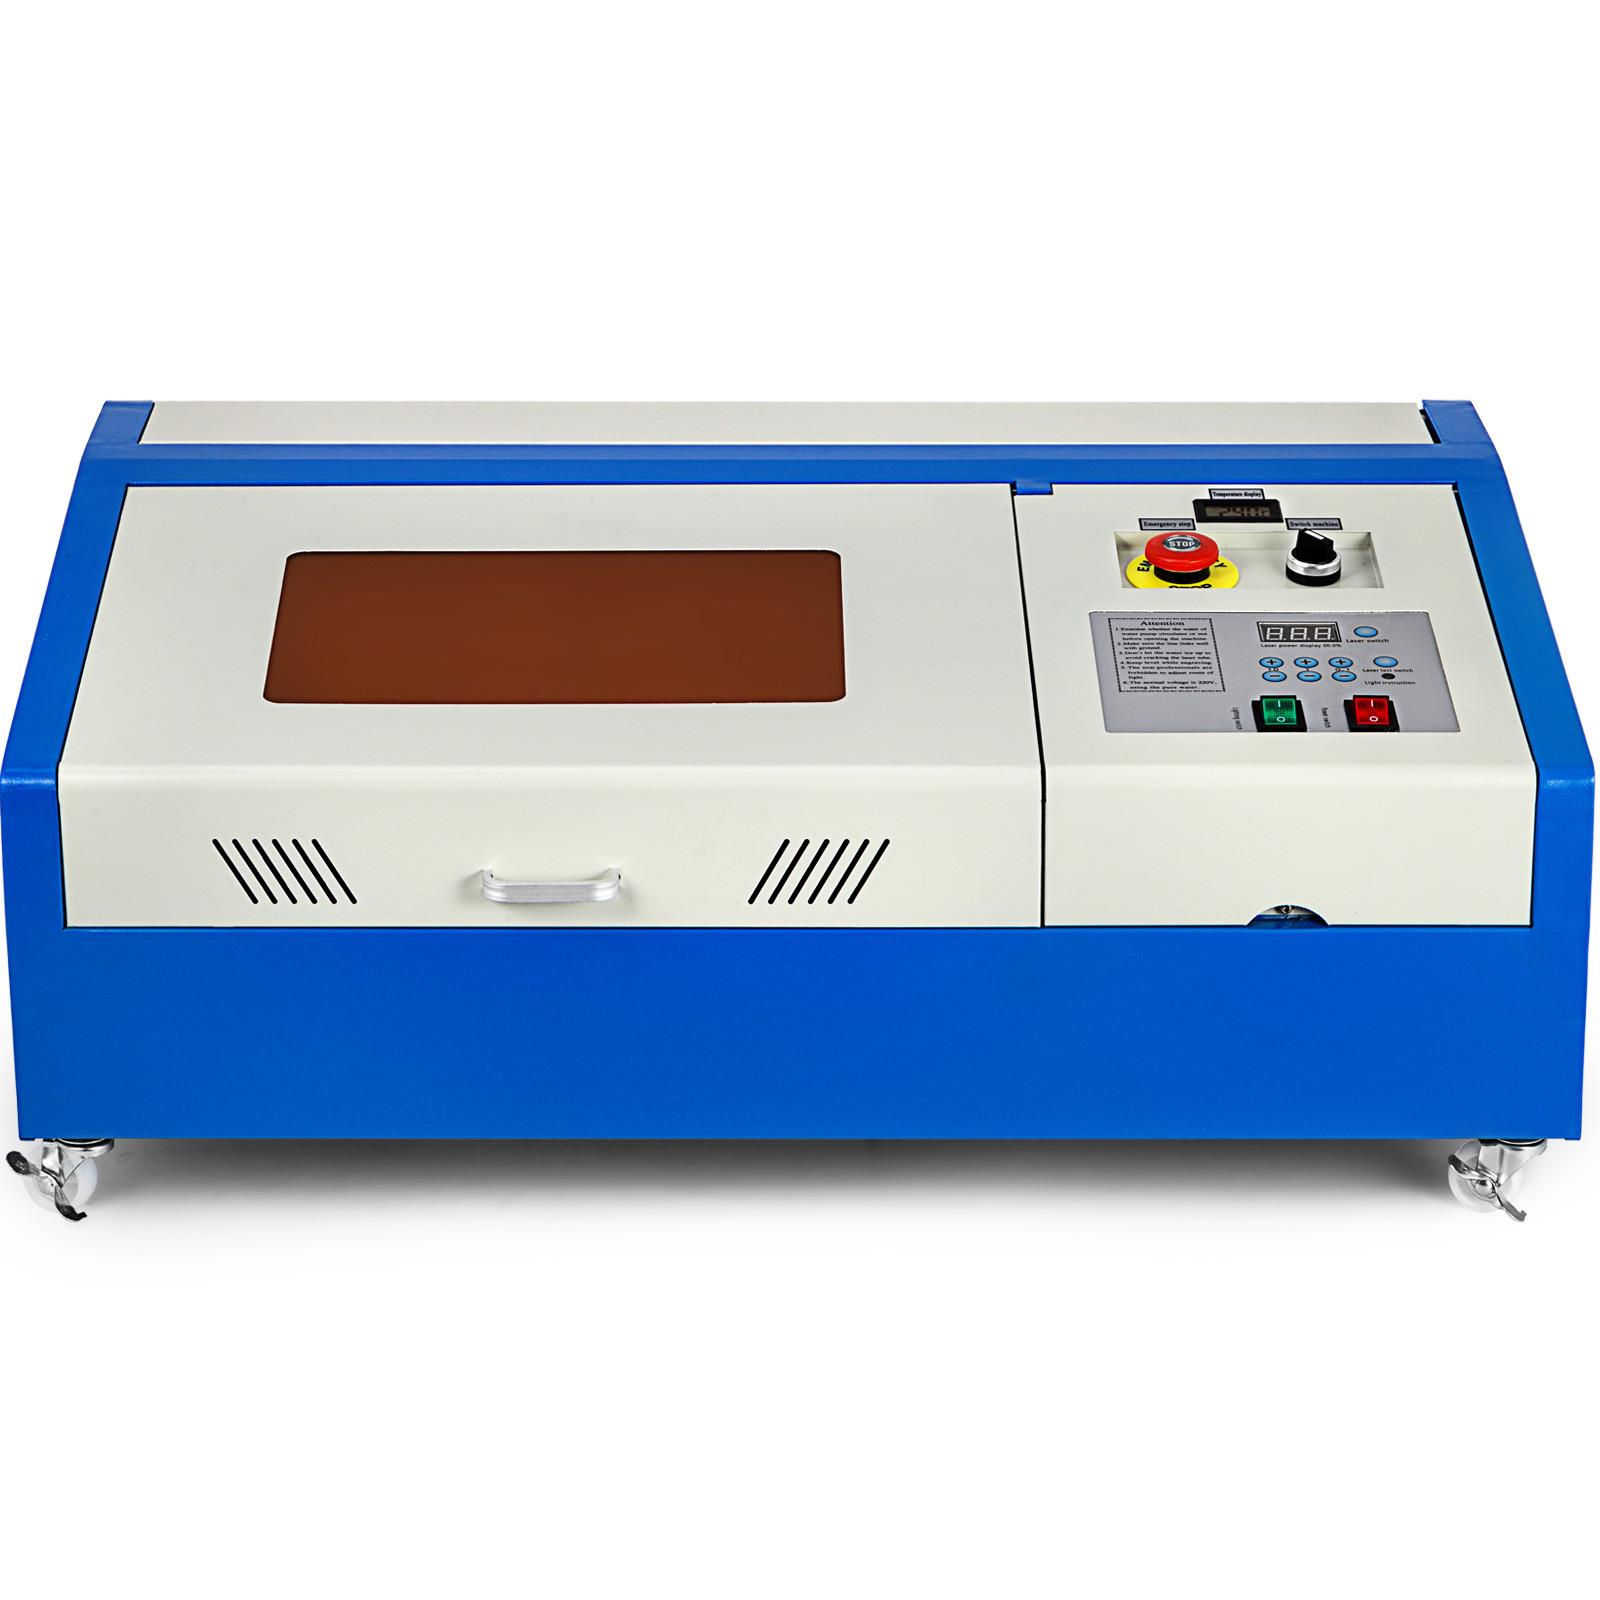 Macchina-per-Incisione-Laser-CO2-40-130W-Asse-Rotante-Tagliatrice-Incisore miniatura 96